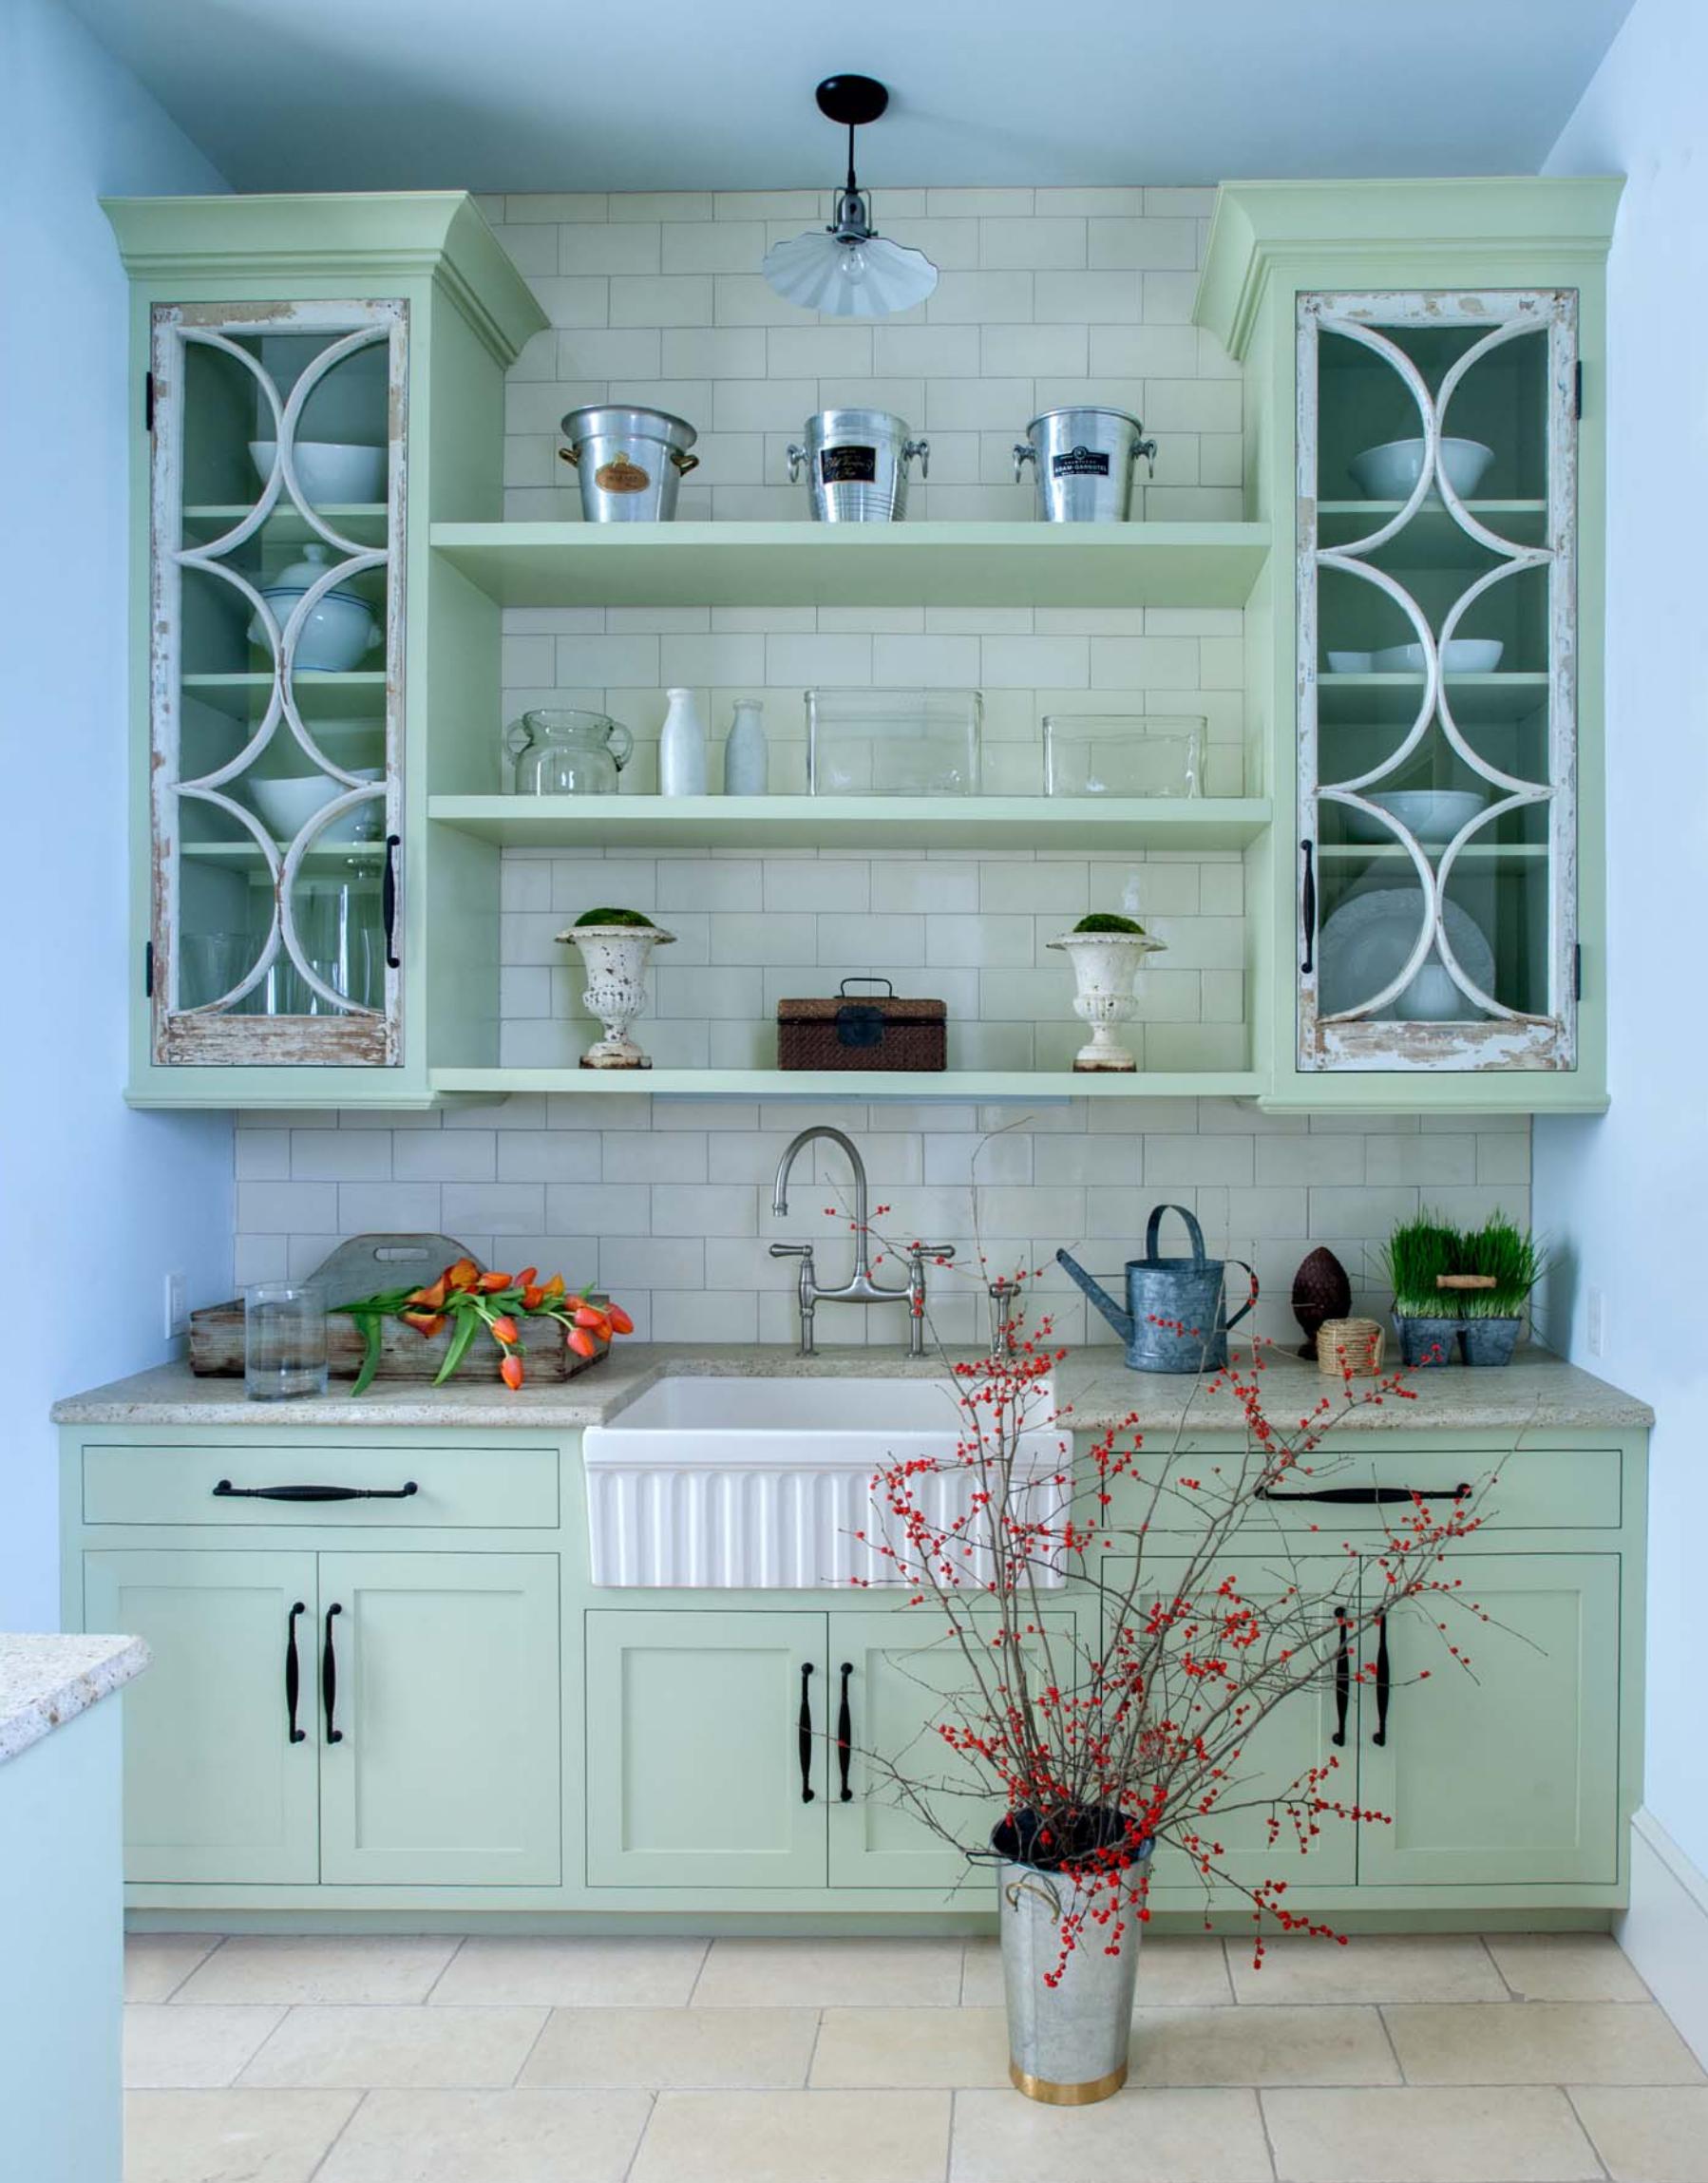 Kitchen at Orr's Island, Harpswell by Banks Design Associates Ltd.